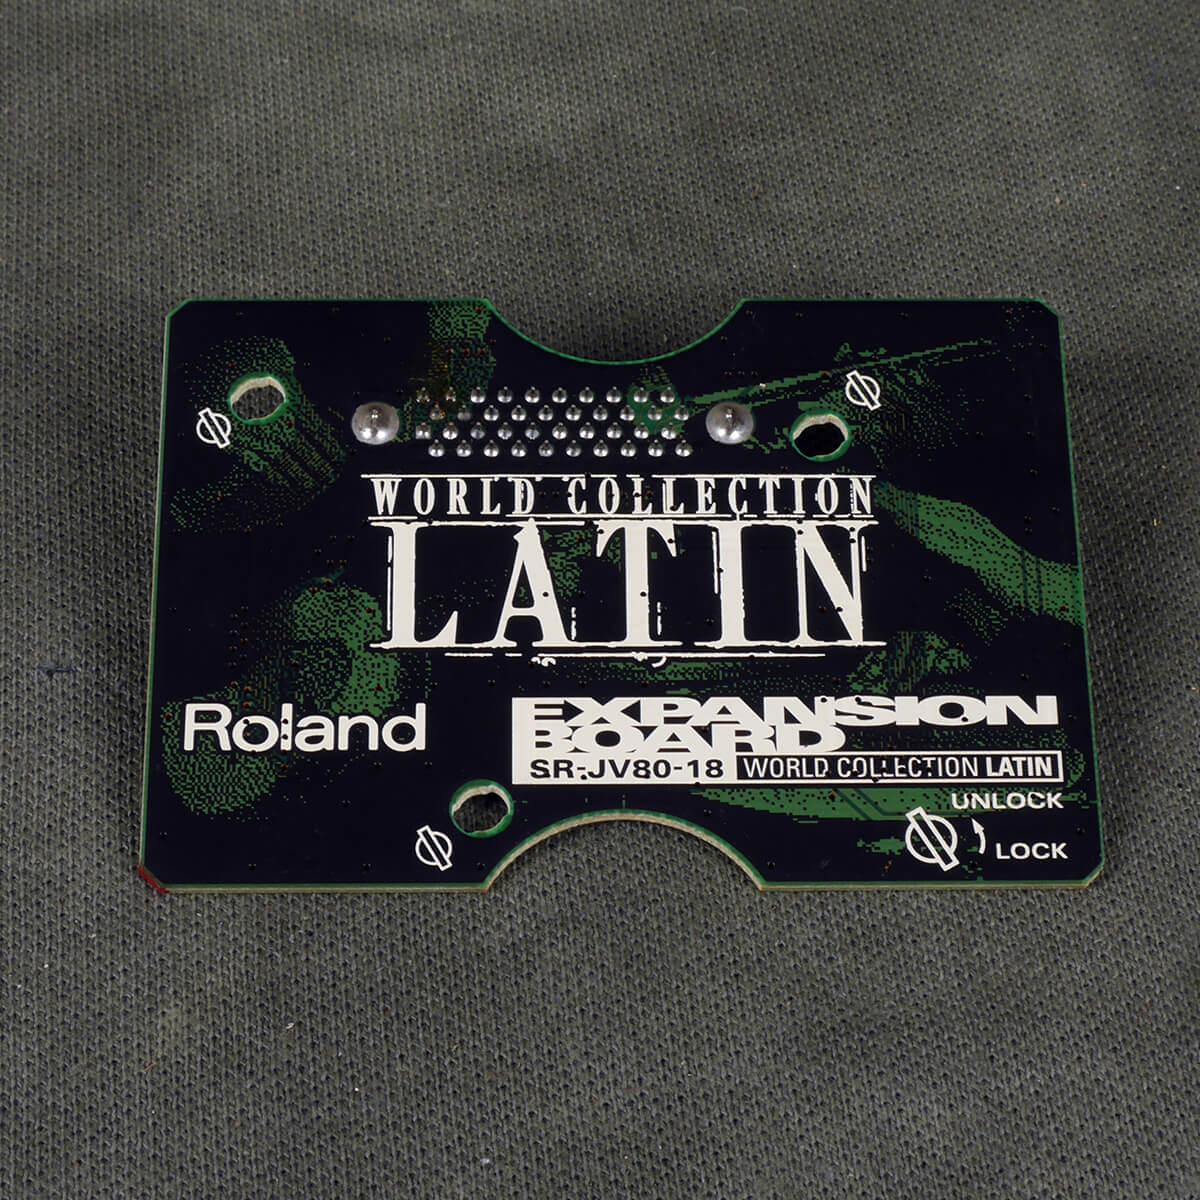 Roland SR-JV80 Expansion Board - 18 World Collection LATIN - 2nd Hand